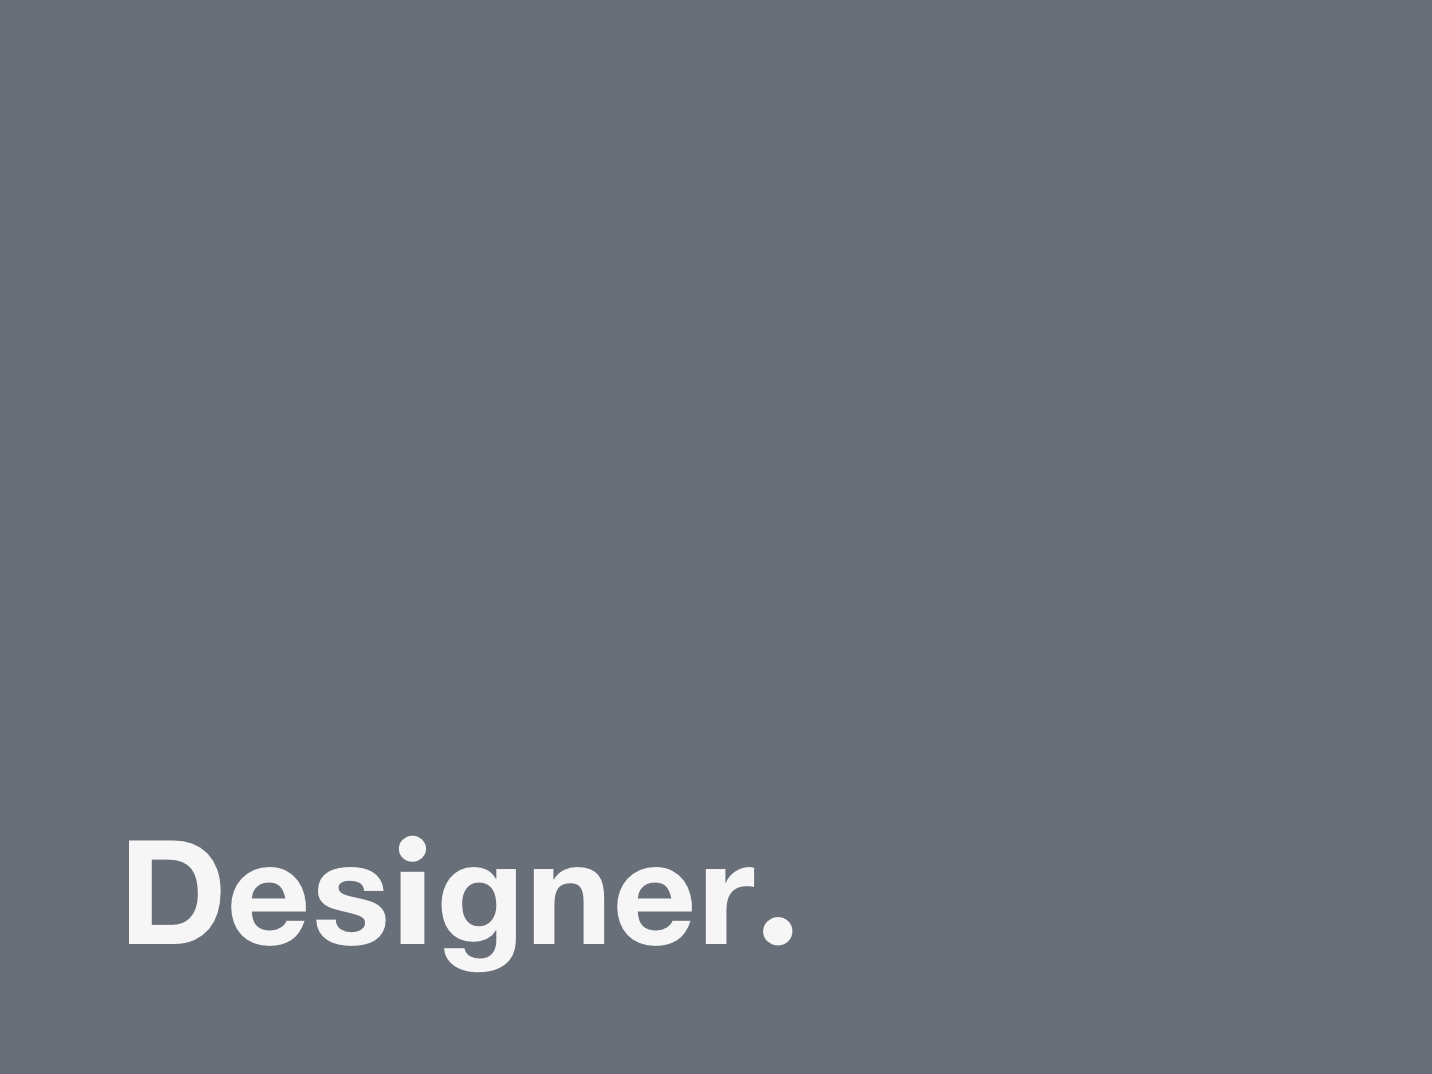 Designer. helvetica typogaphy advertising branding